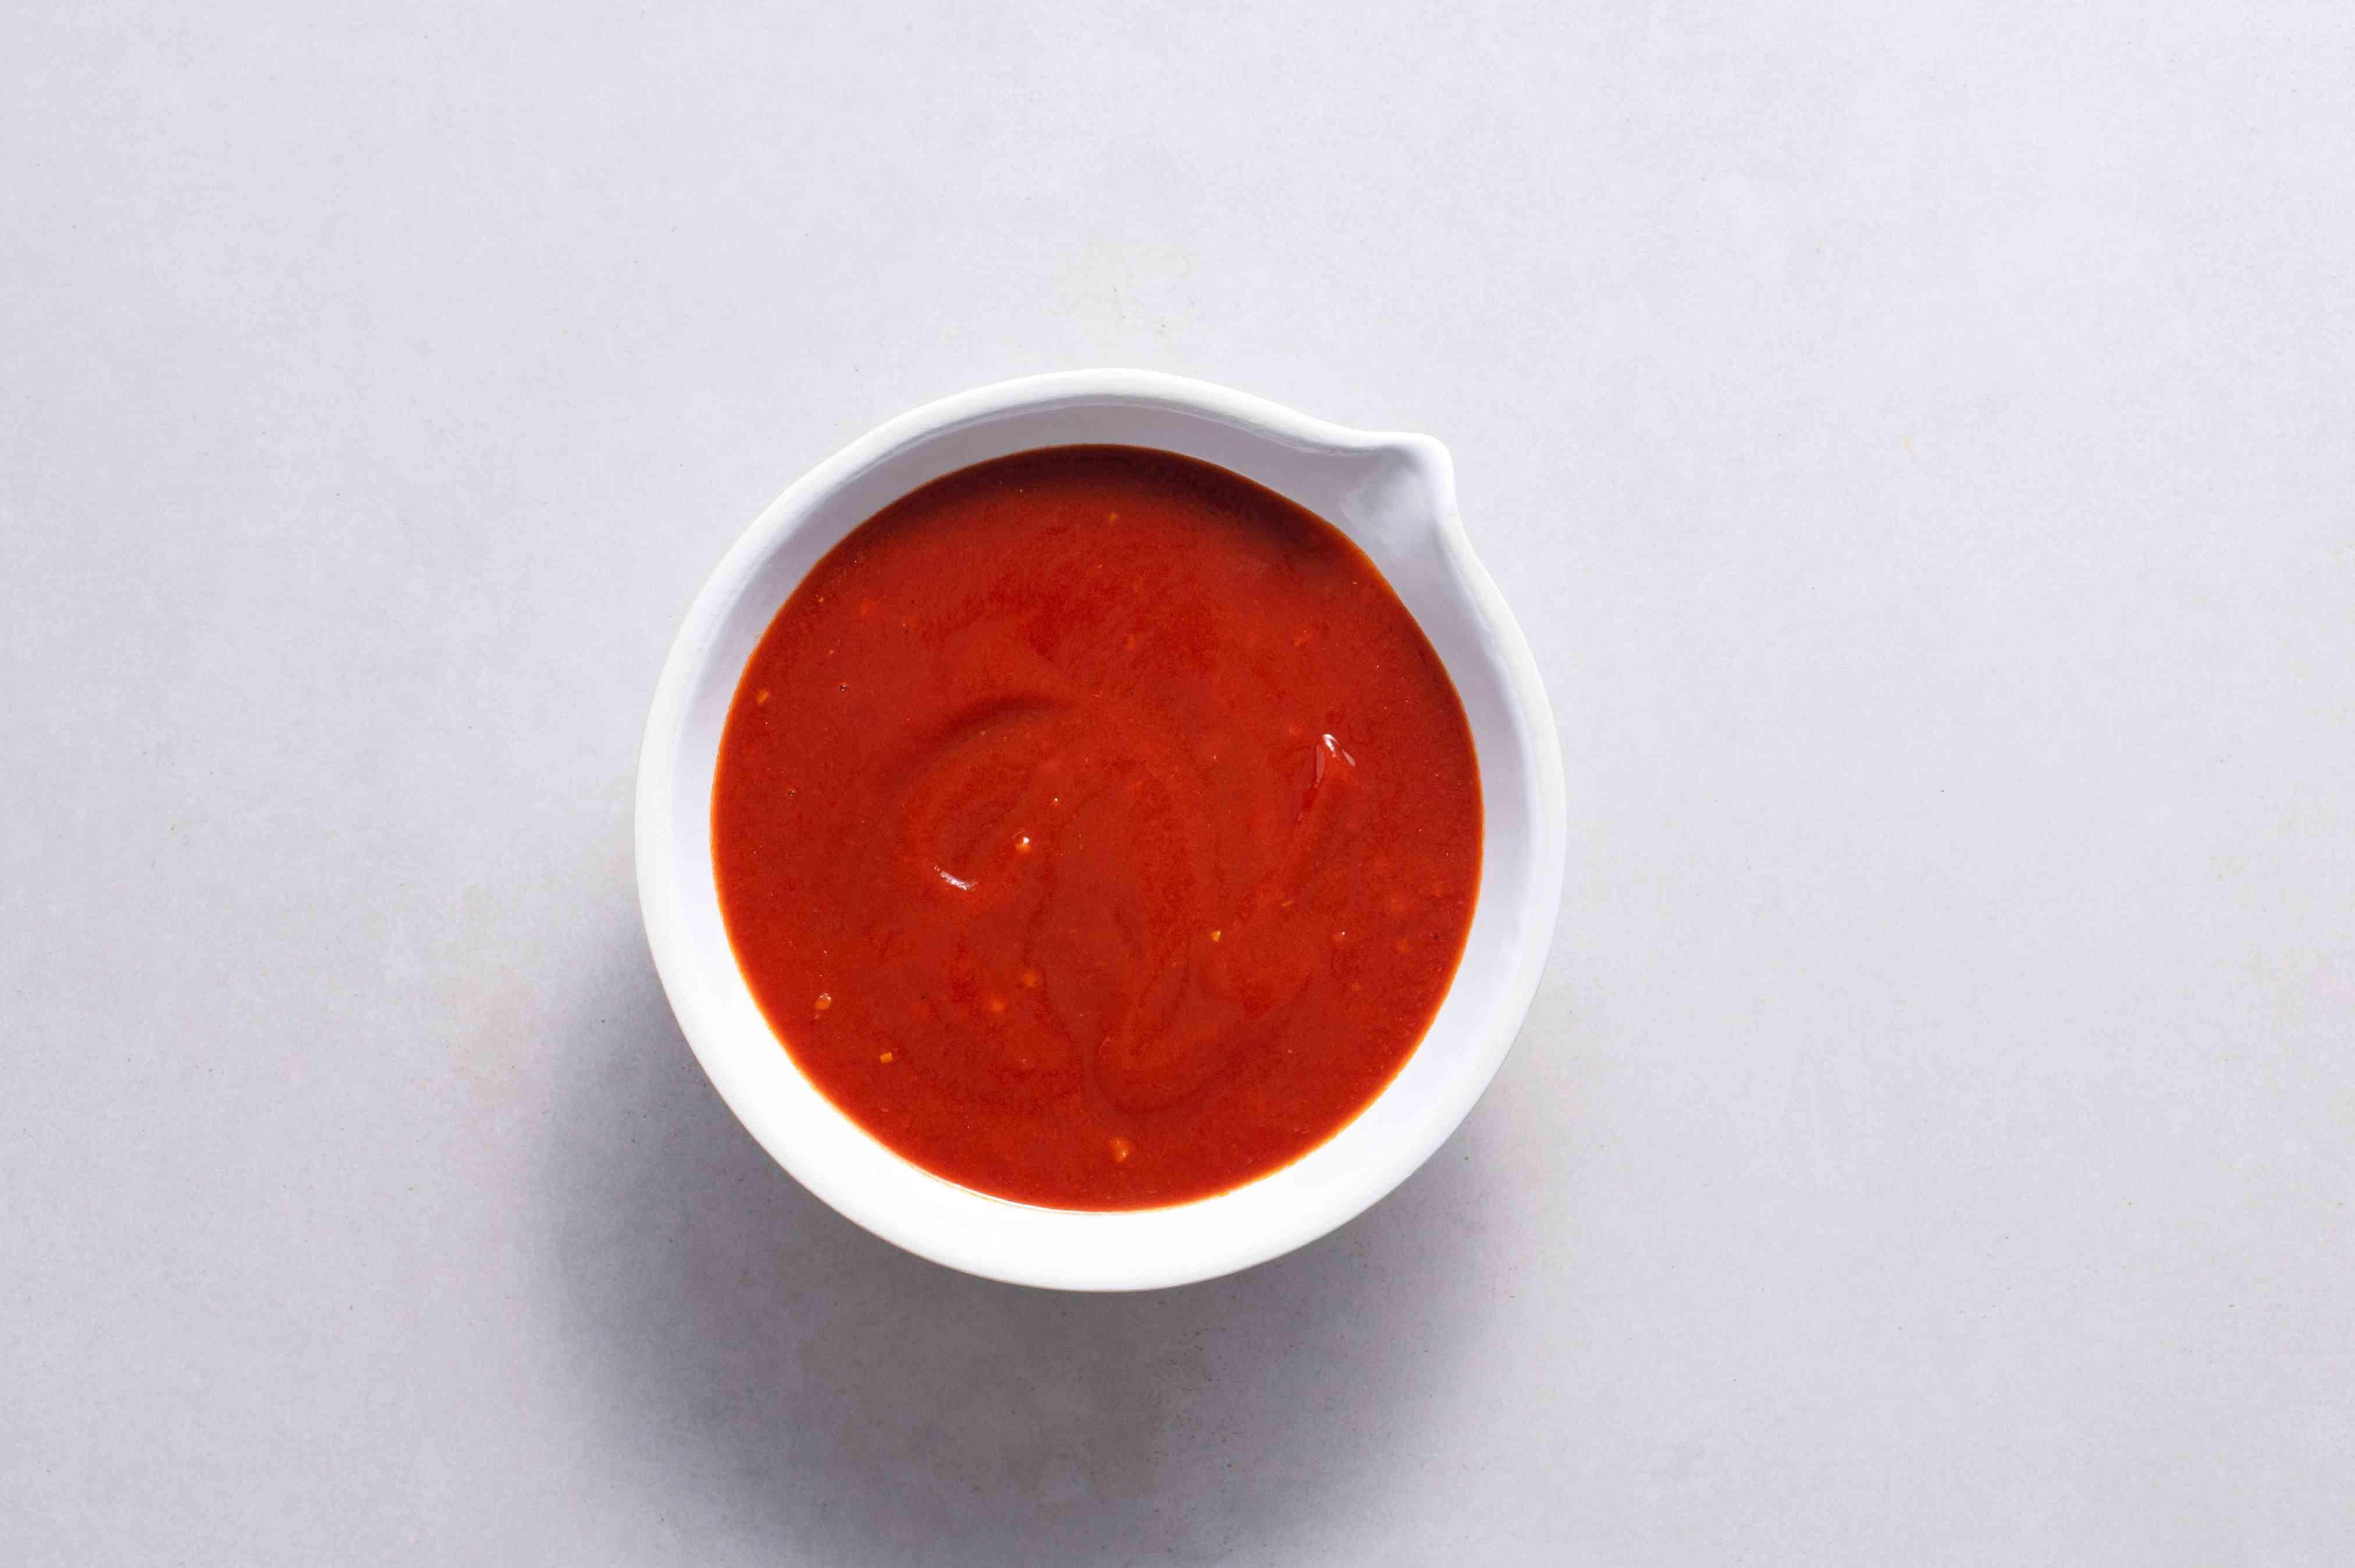 Kansas City Rib Sauce in a bowl